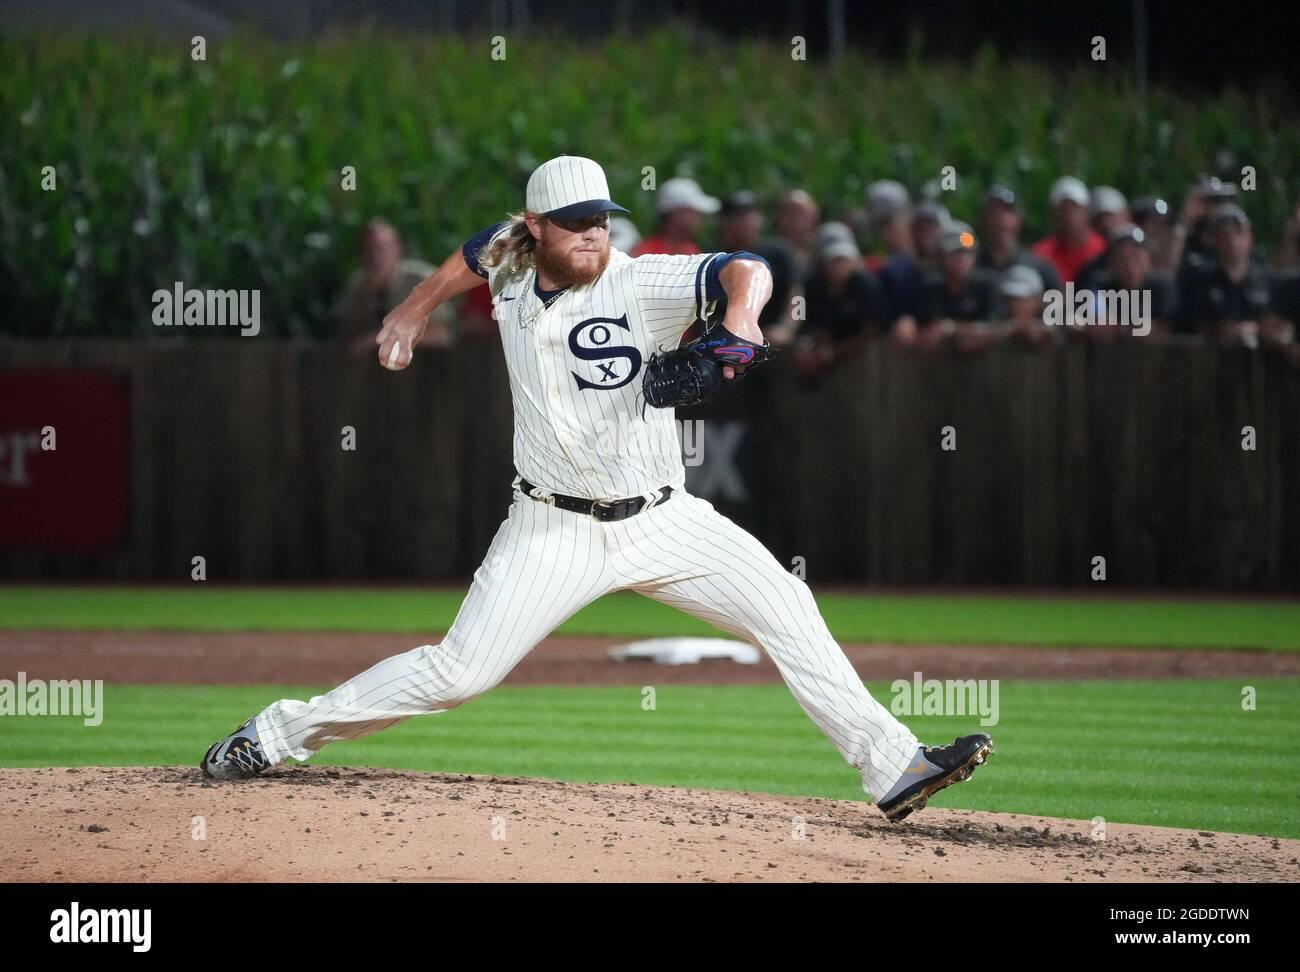 Dyersville, Stati Uniti. 12 agosto 2021. Chicago White Sox rilievo lanciatore Craig Kimbrel consegna al New York Yankees durante l'ottavo inning del MLB Field of Dreams Game a Dyersville, Iowa, giovedì 12 agosto 2021. Photo by Pat Benic/UPI Credit: UPI/Alamy Live News Foto Stock